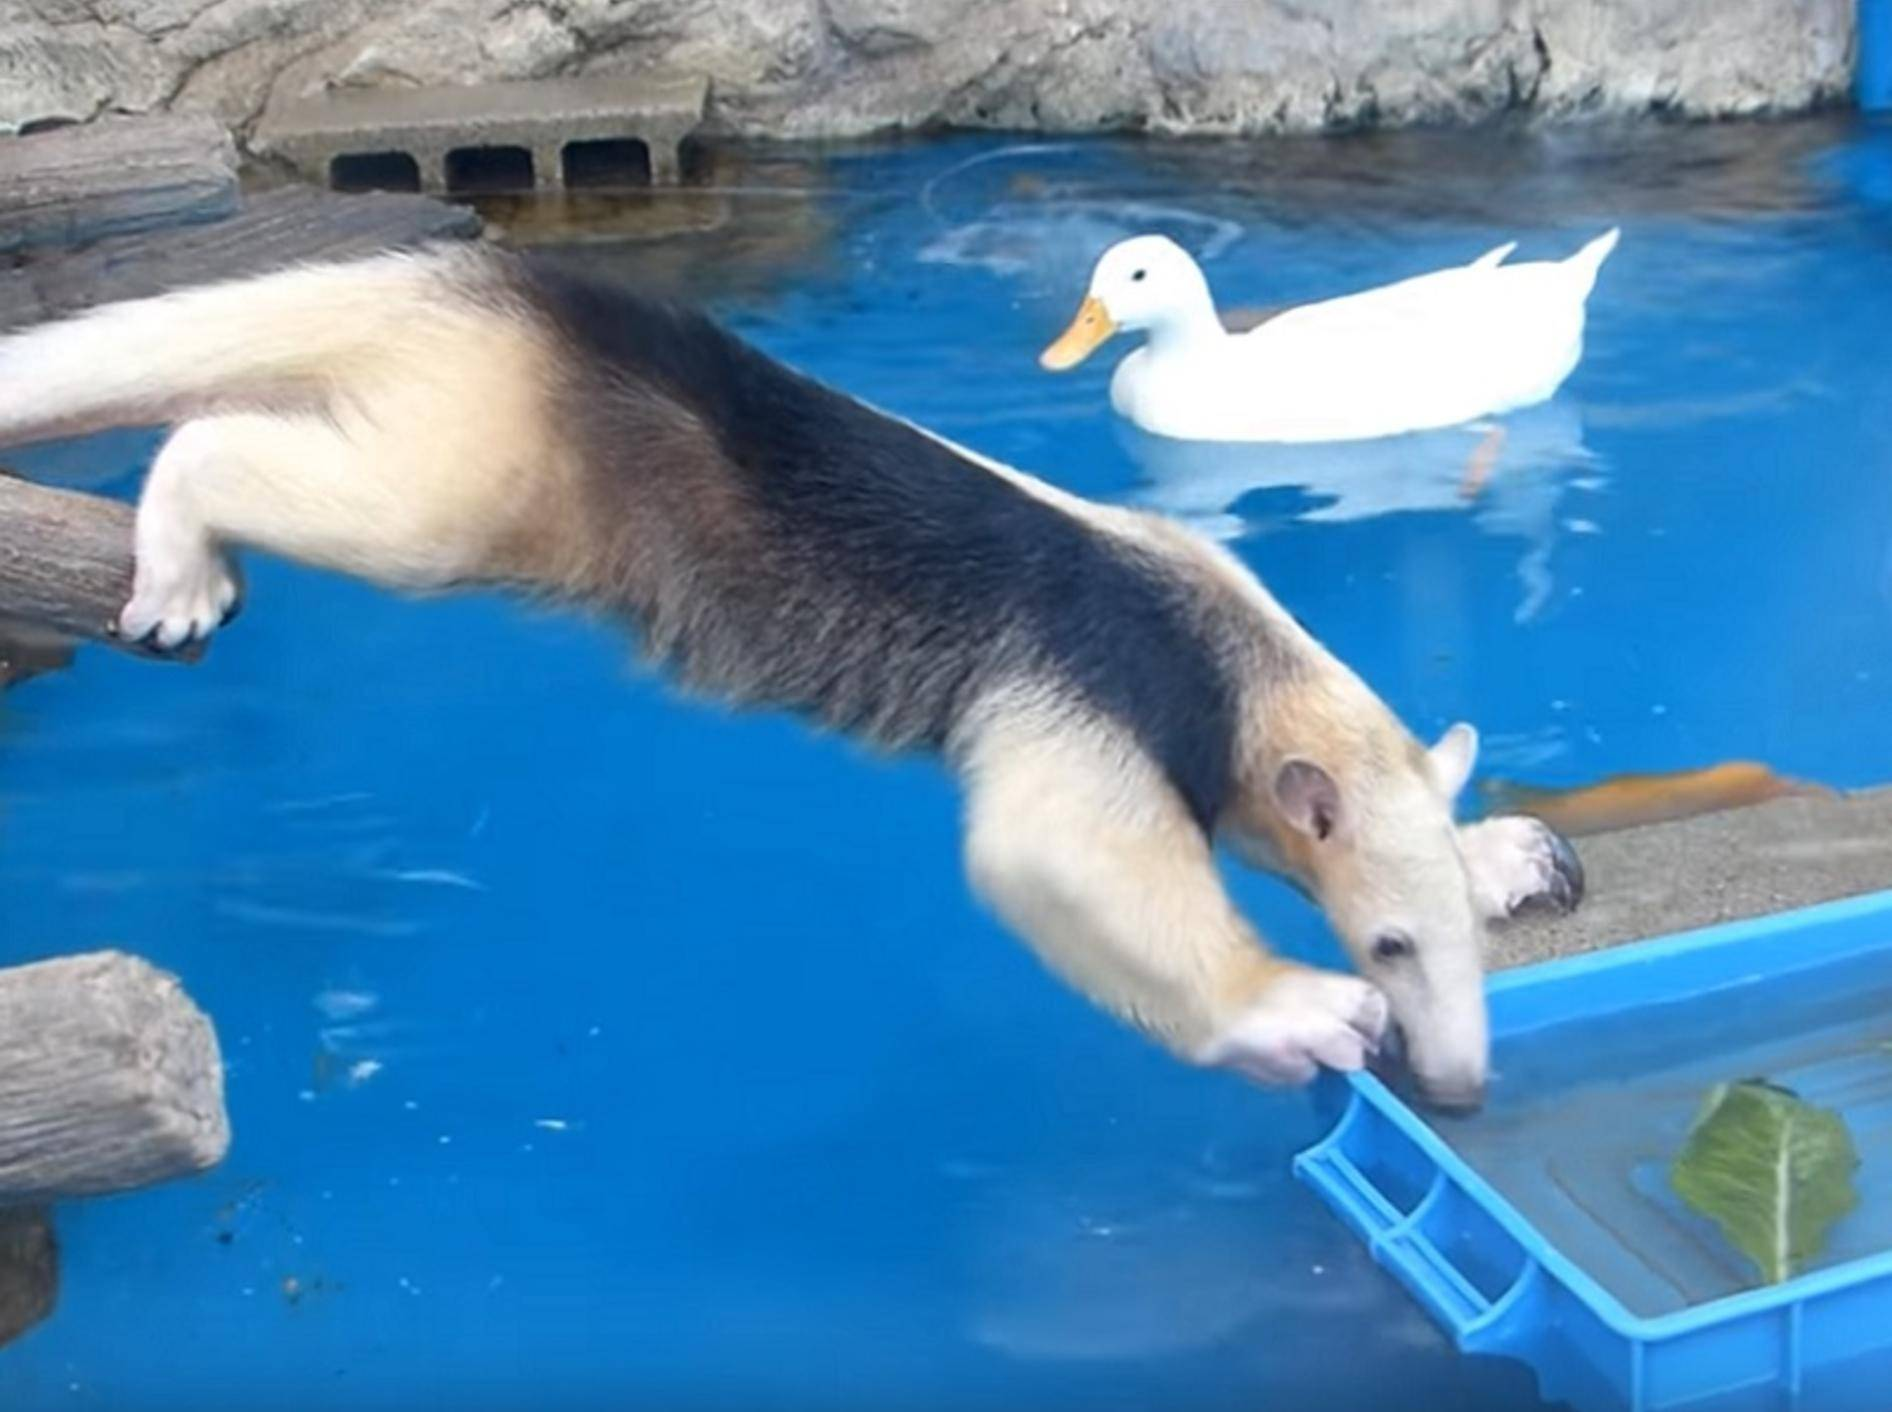 Tamandua angelt nach Futterbox und plumpst fast ins Wasser – Youtube / Muny Rakko